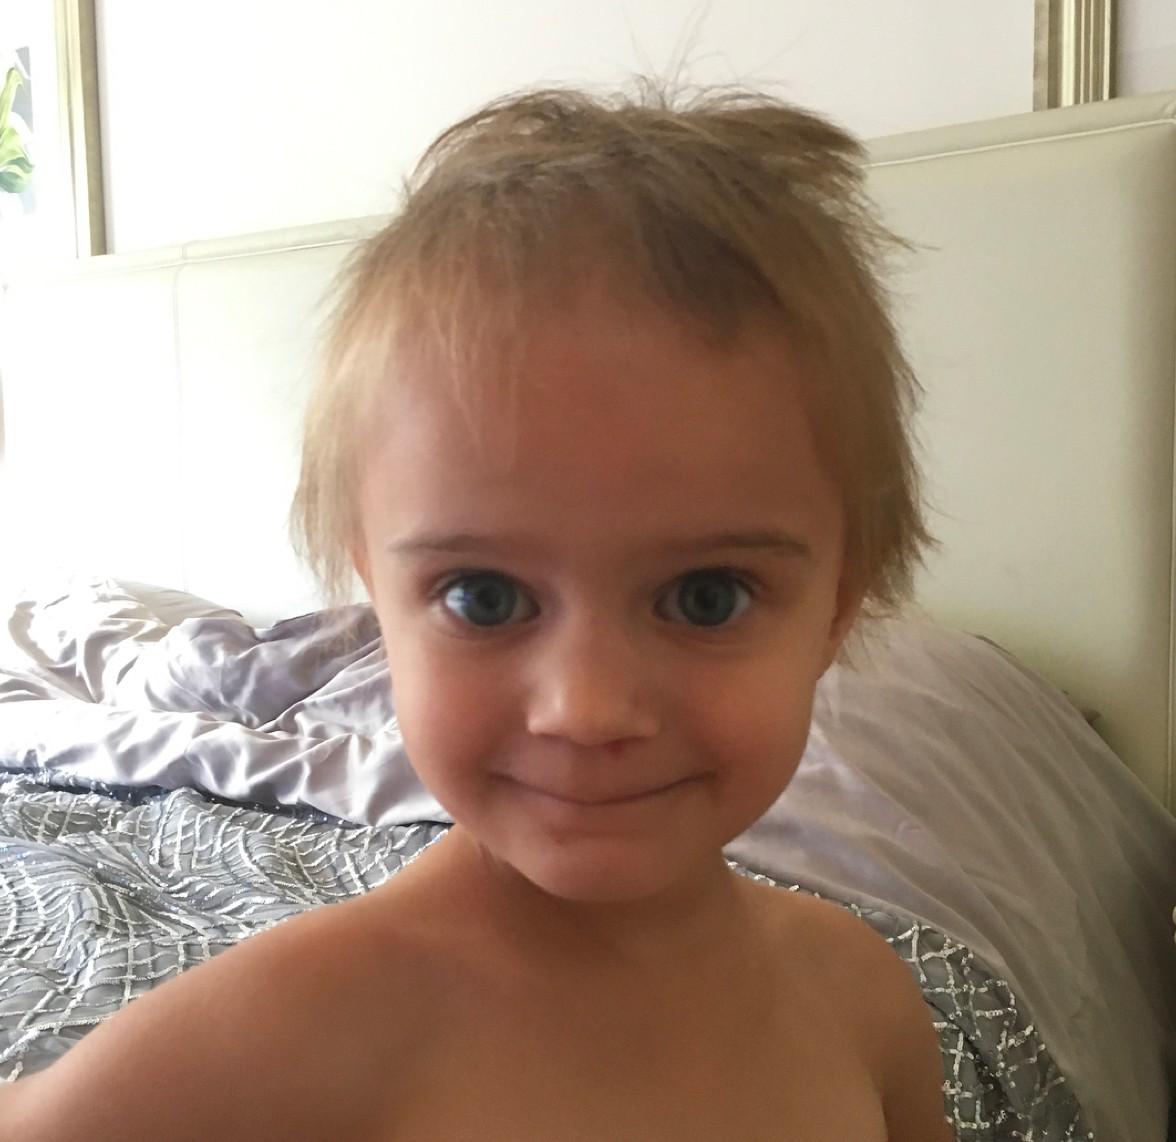 kerry-katona-child-cuts-hair_179617